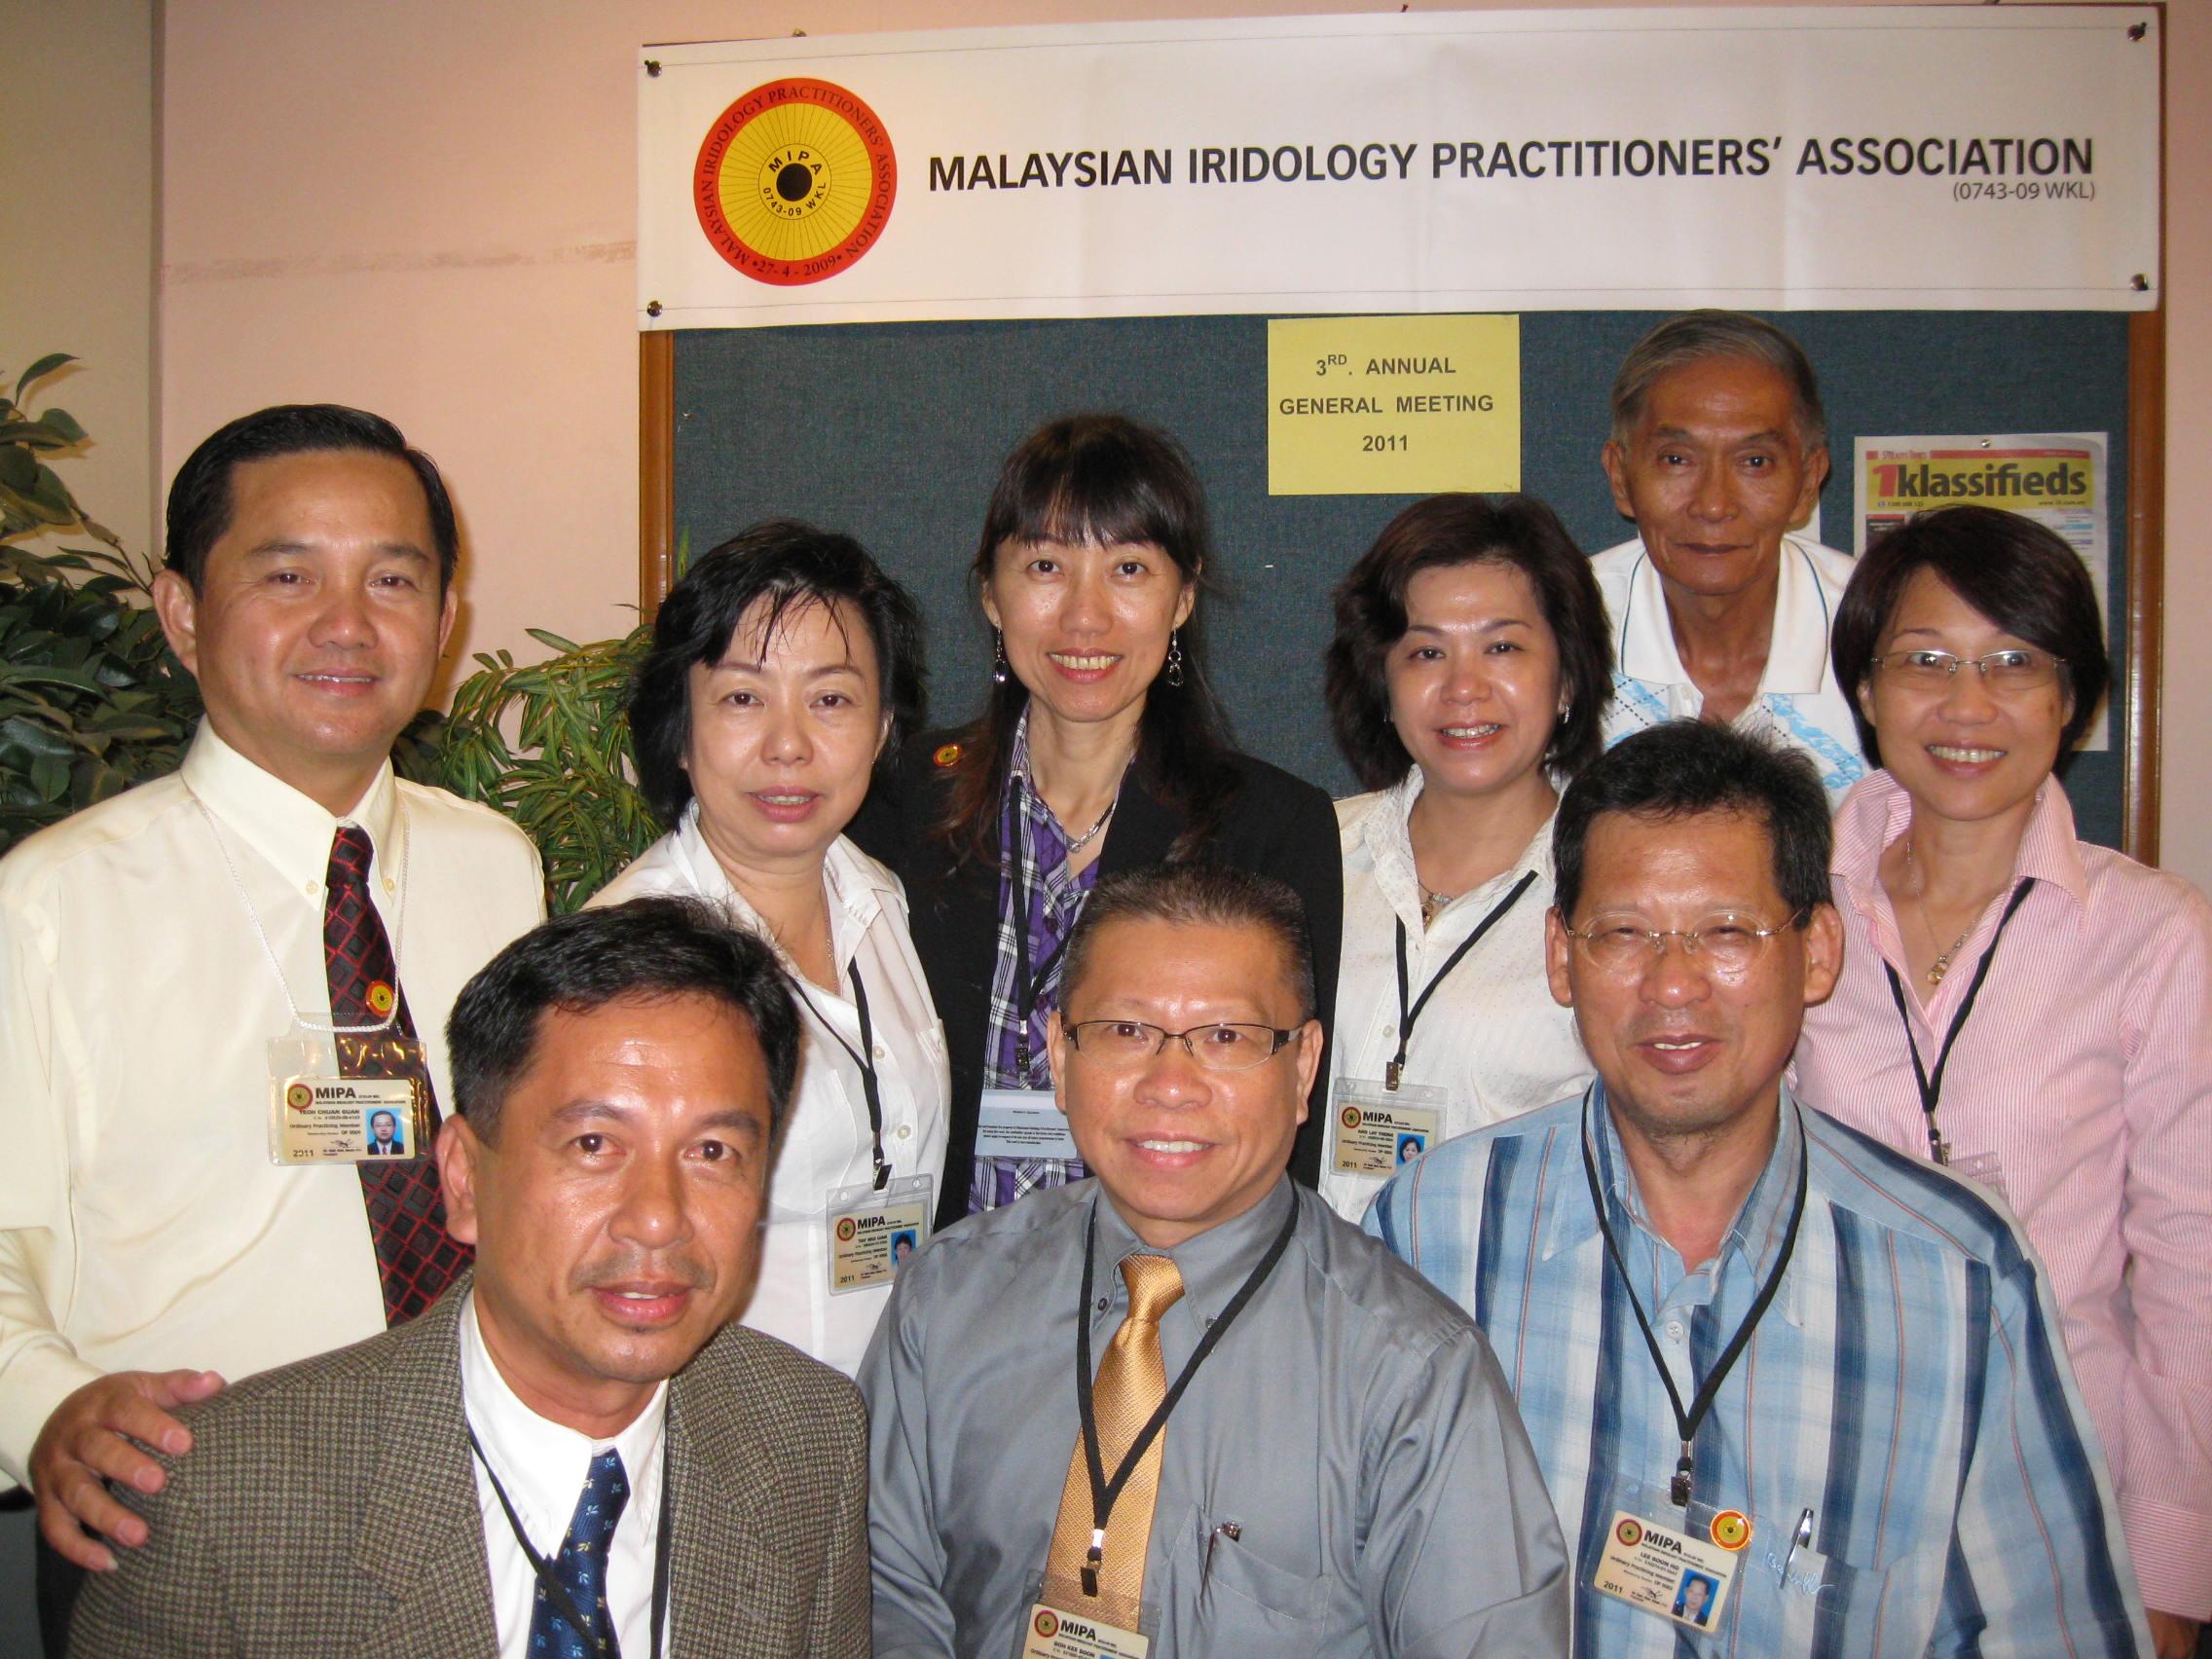 international iridology practitioners association 4